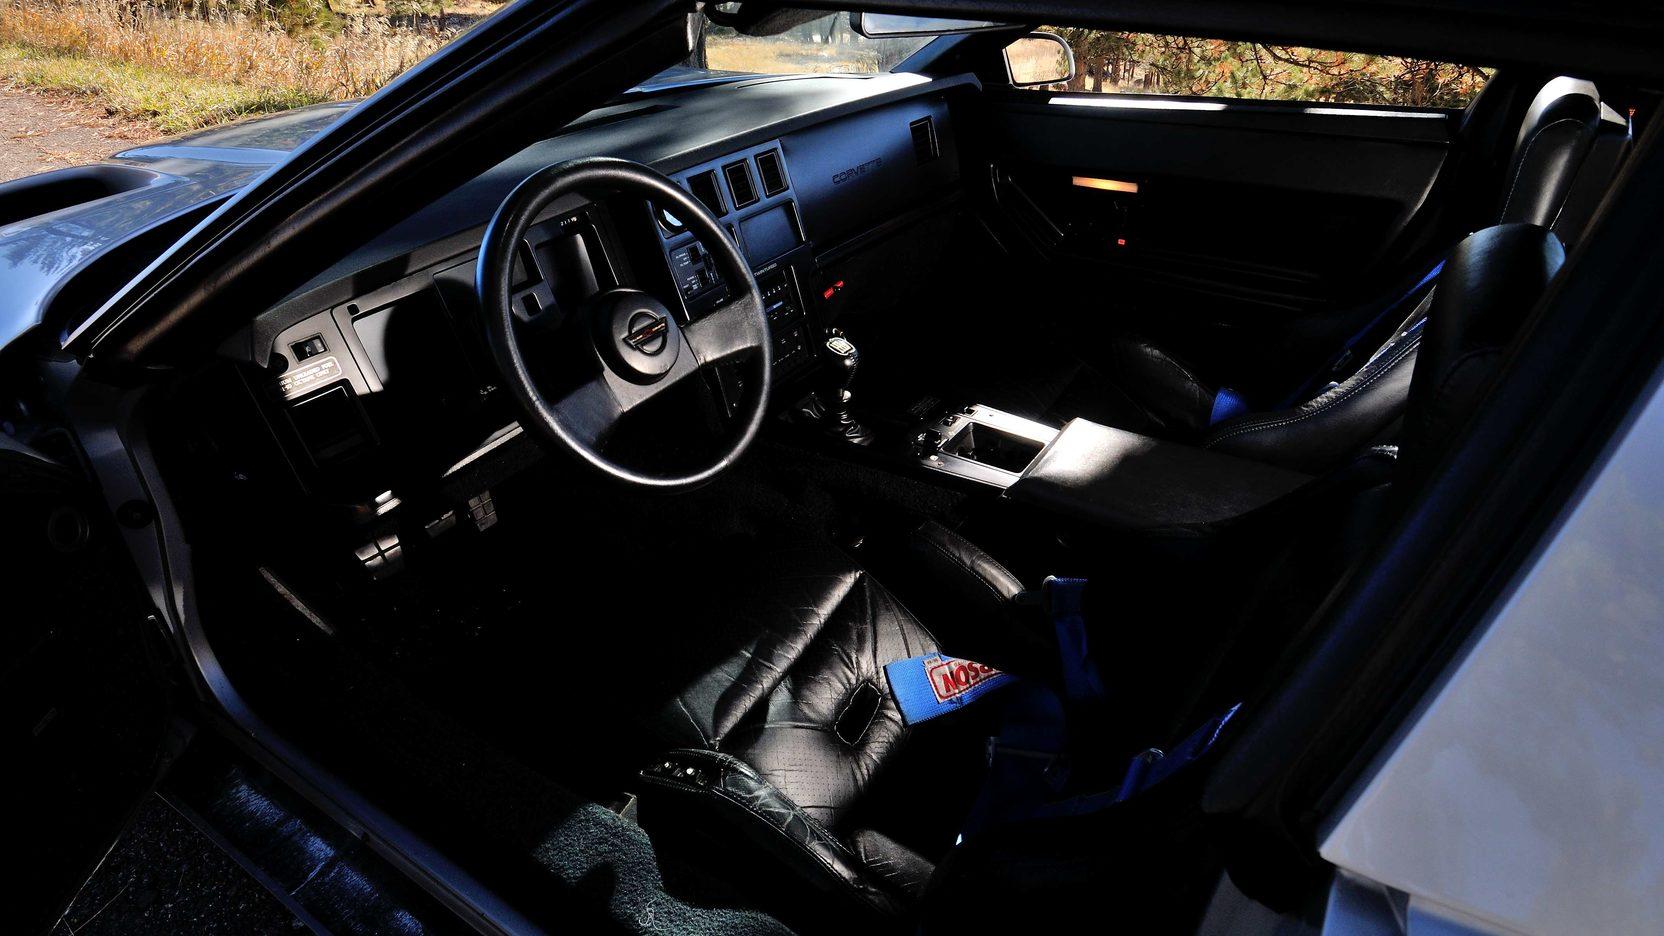 1988 Callaway Sledgehammer interior